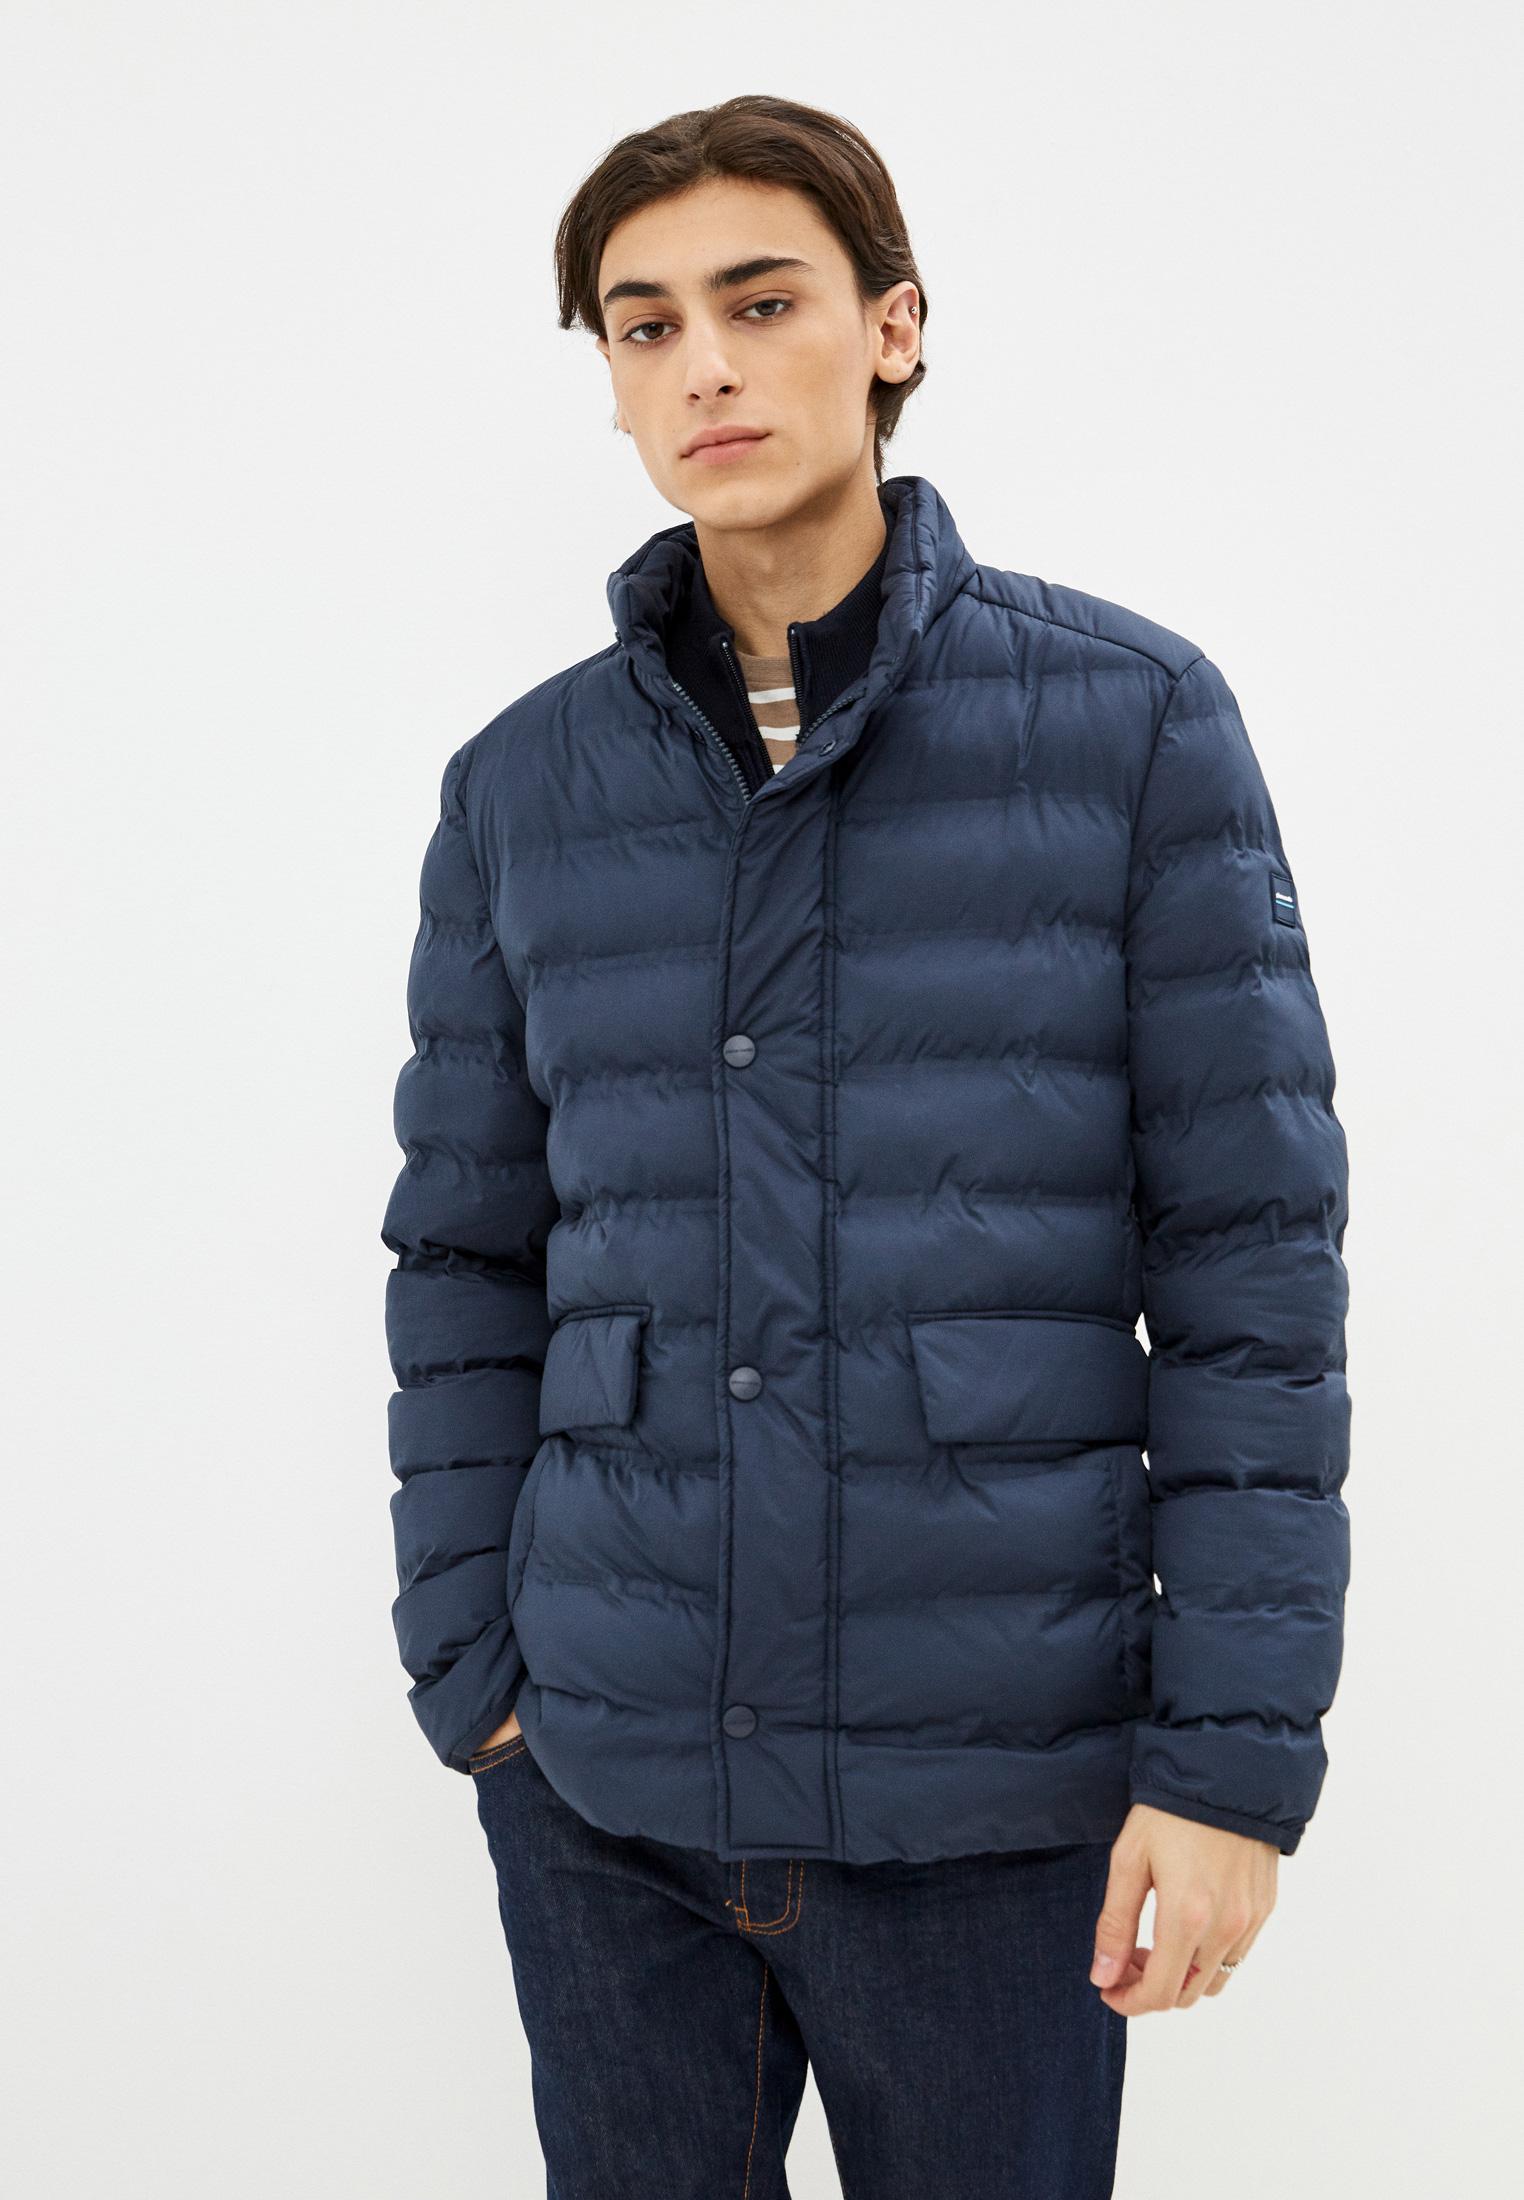 Утепленная куртка Pierre Cardin (Пьер Кардин) Куртка утепленная Pierre Cardin